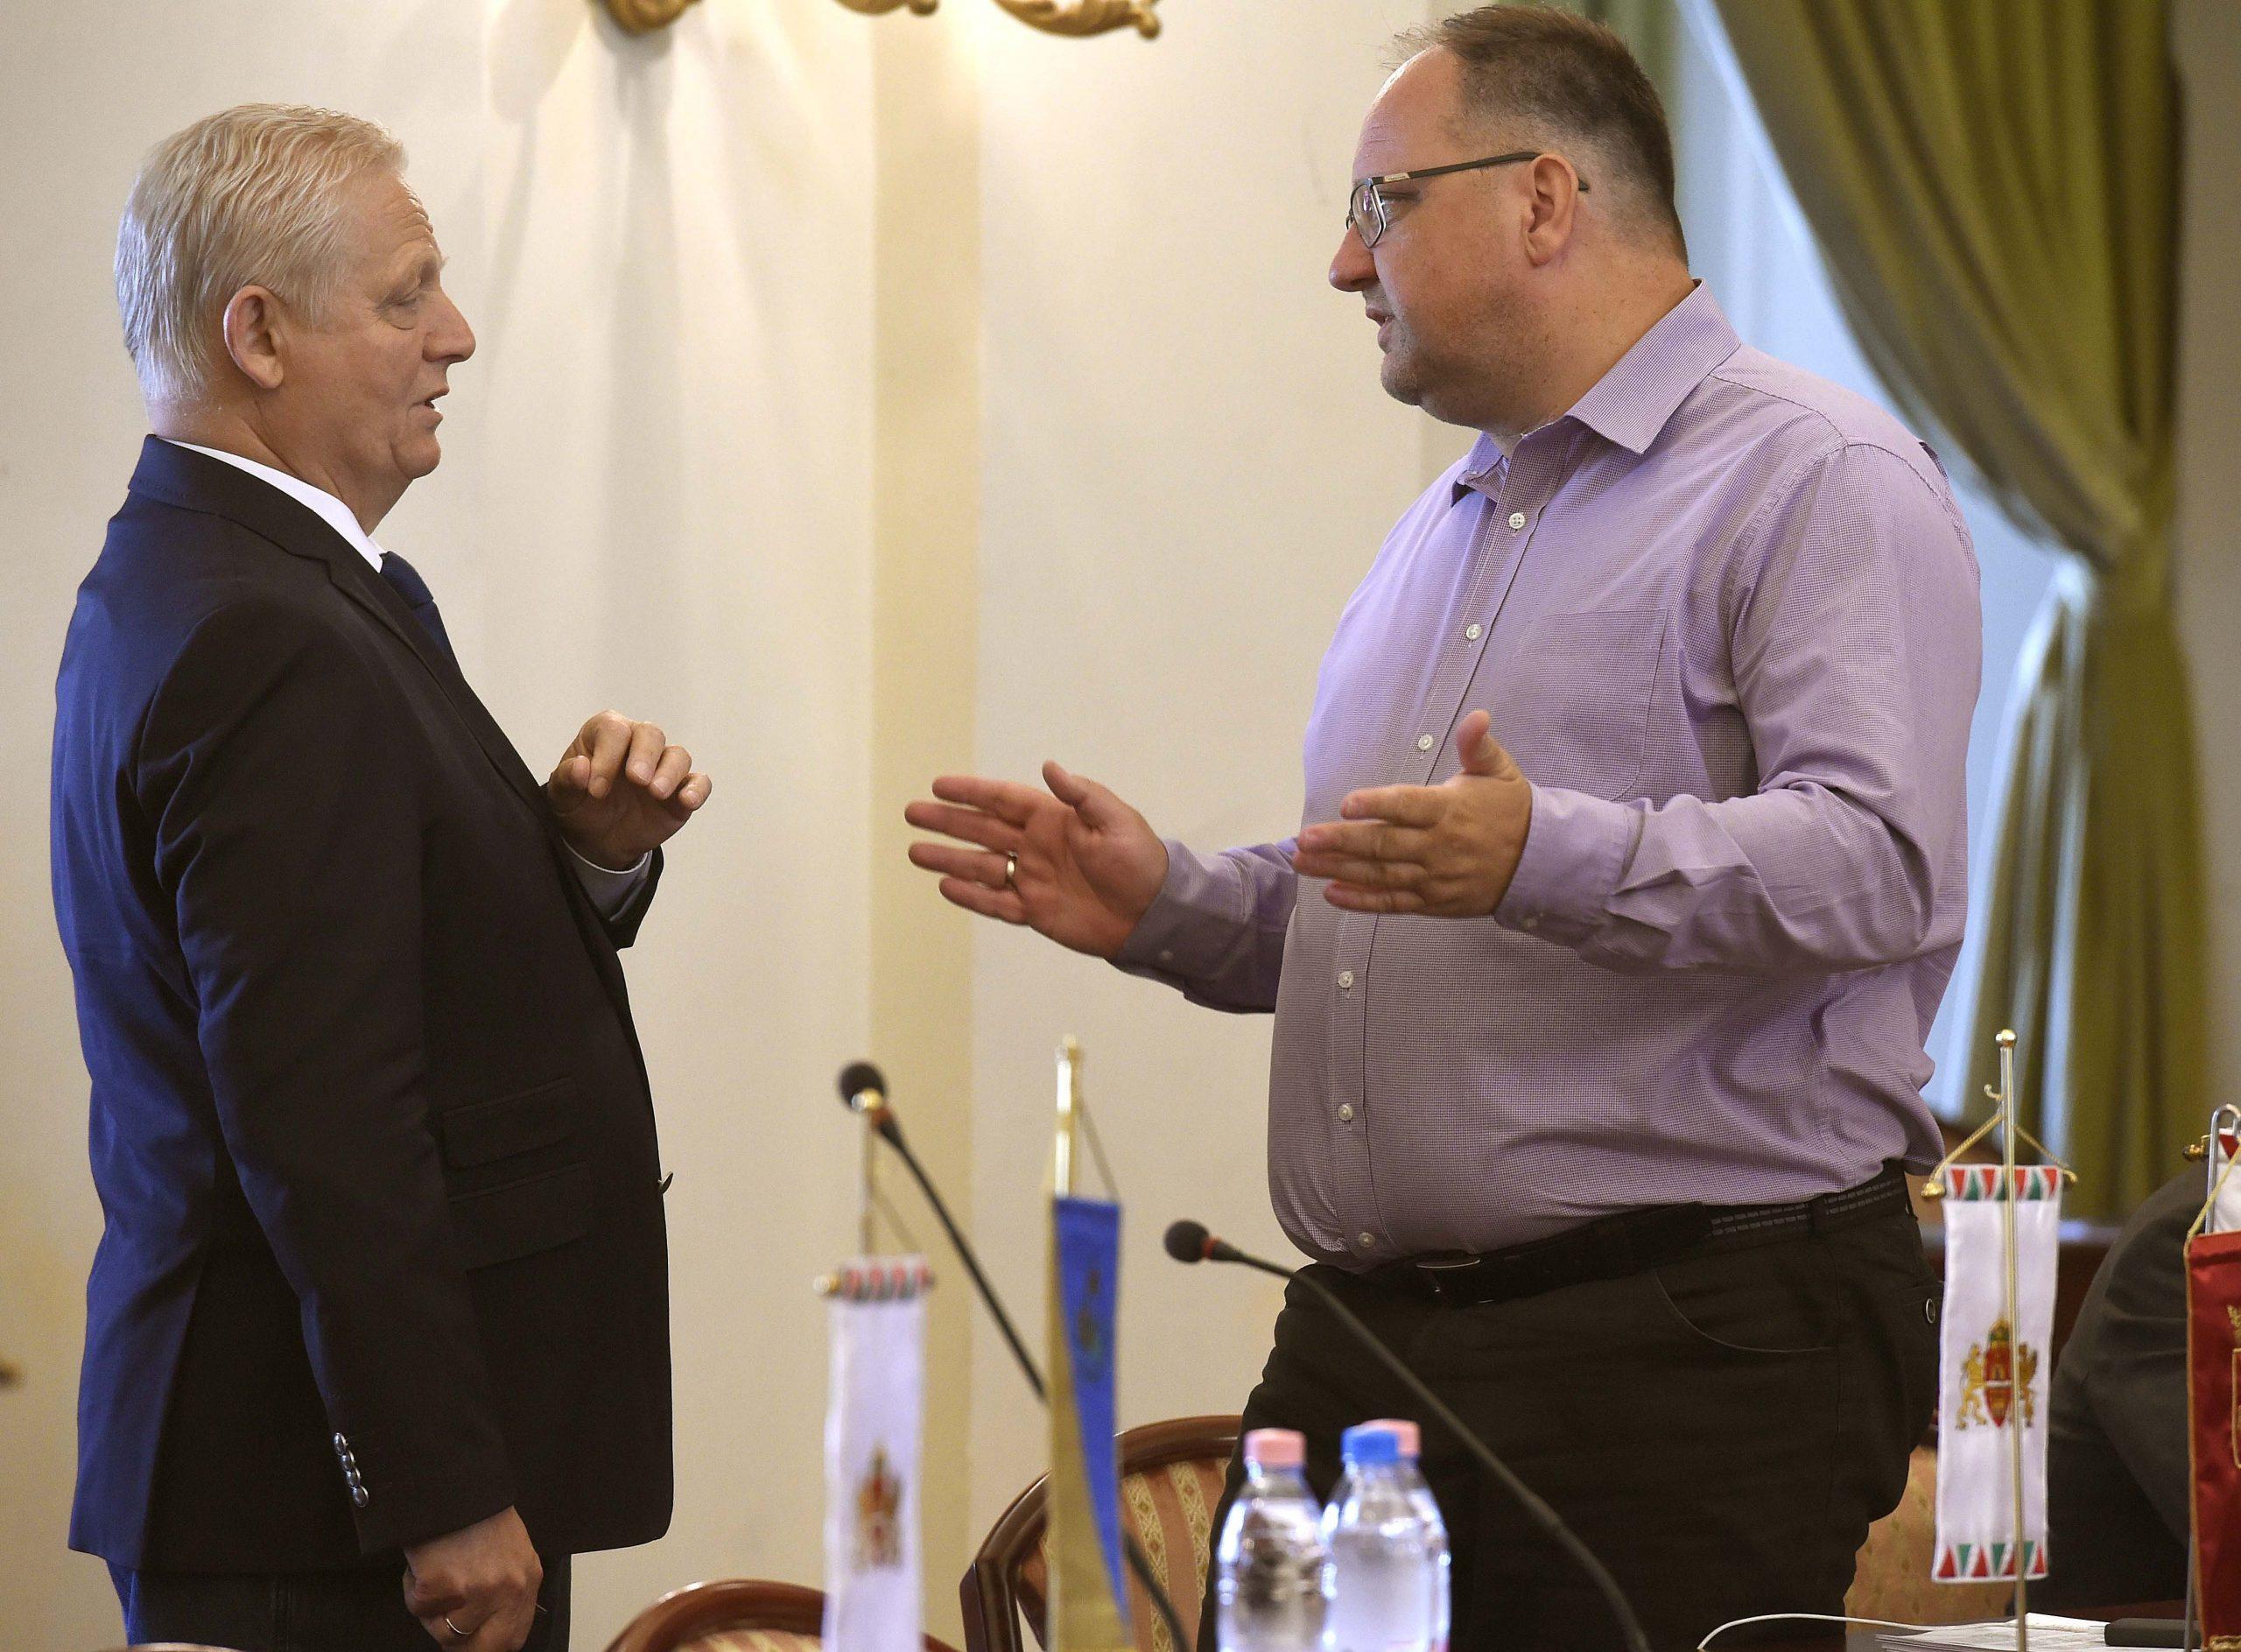 Fidesz: Chain Bridge Revamp to Cost Huf 5 Bn More than Previous Leadership's Plan